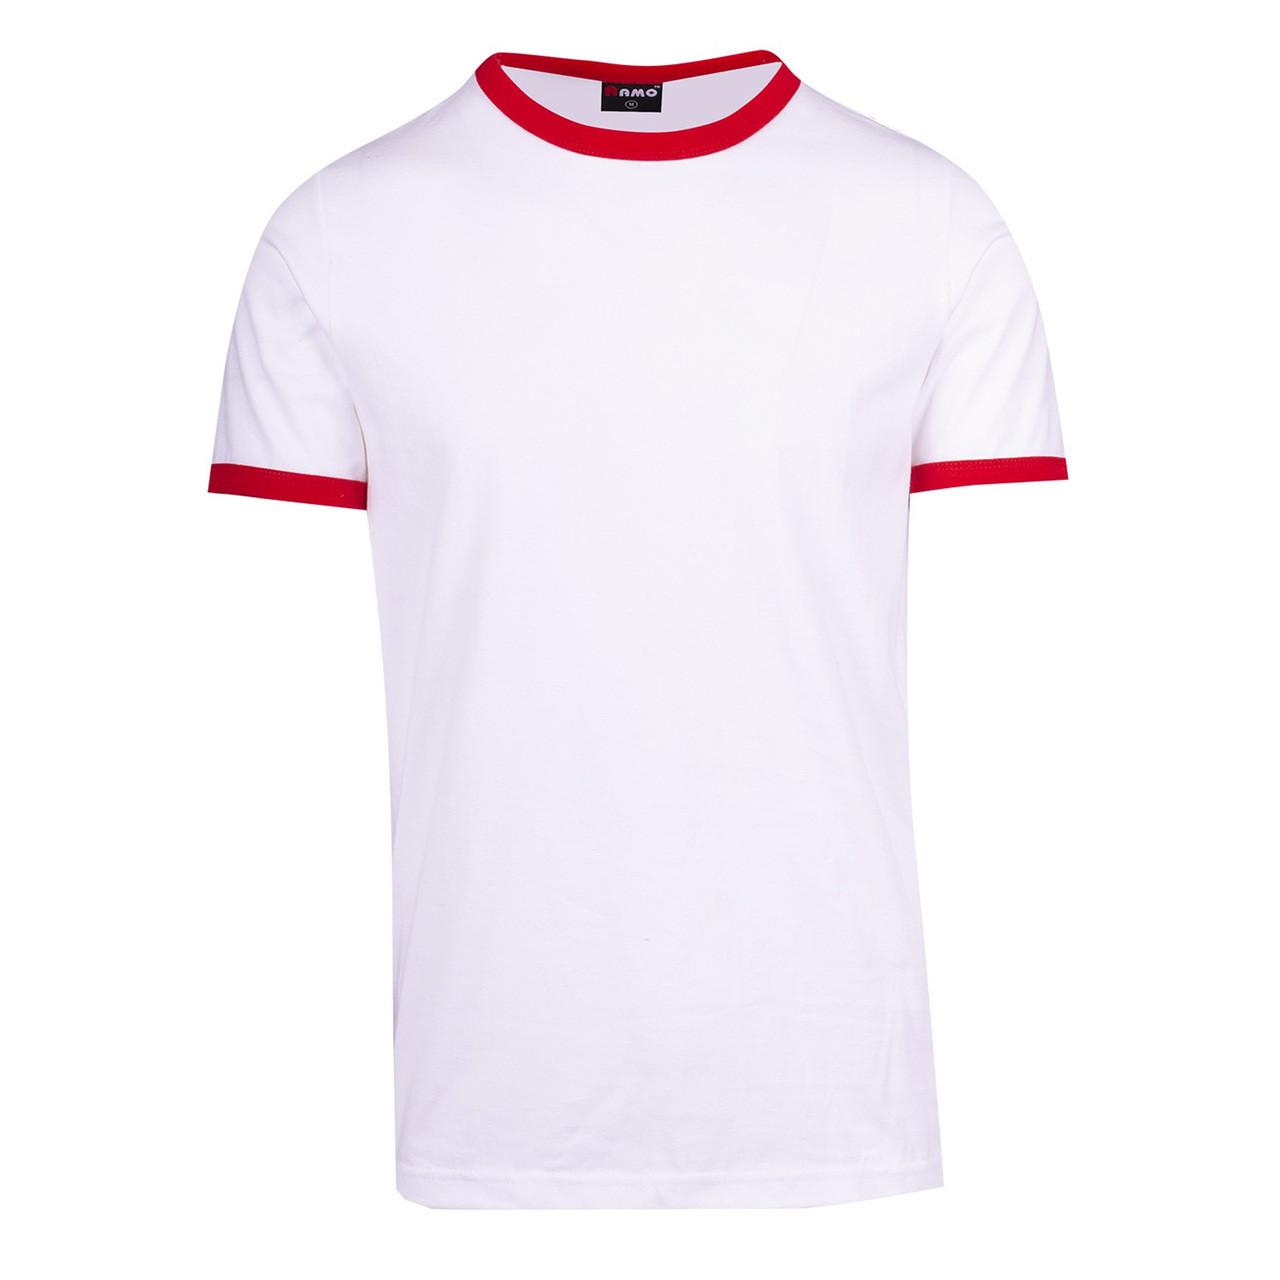 Cotton Plain Blank Men/'s Women/'s Tee Shirt Tshirt T-Shirt NEW white //grey// navy